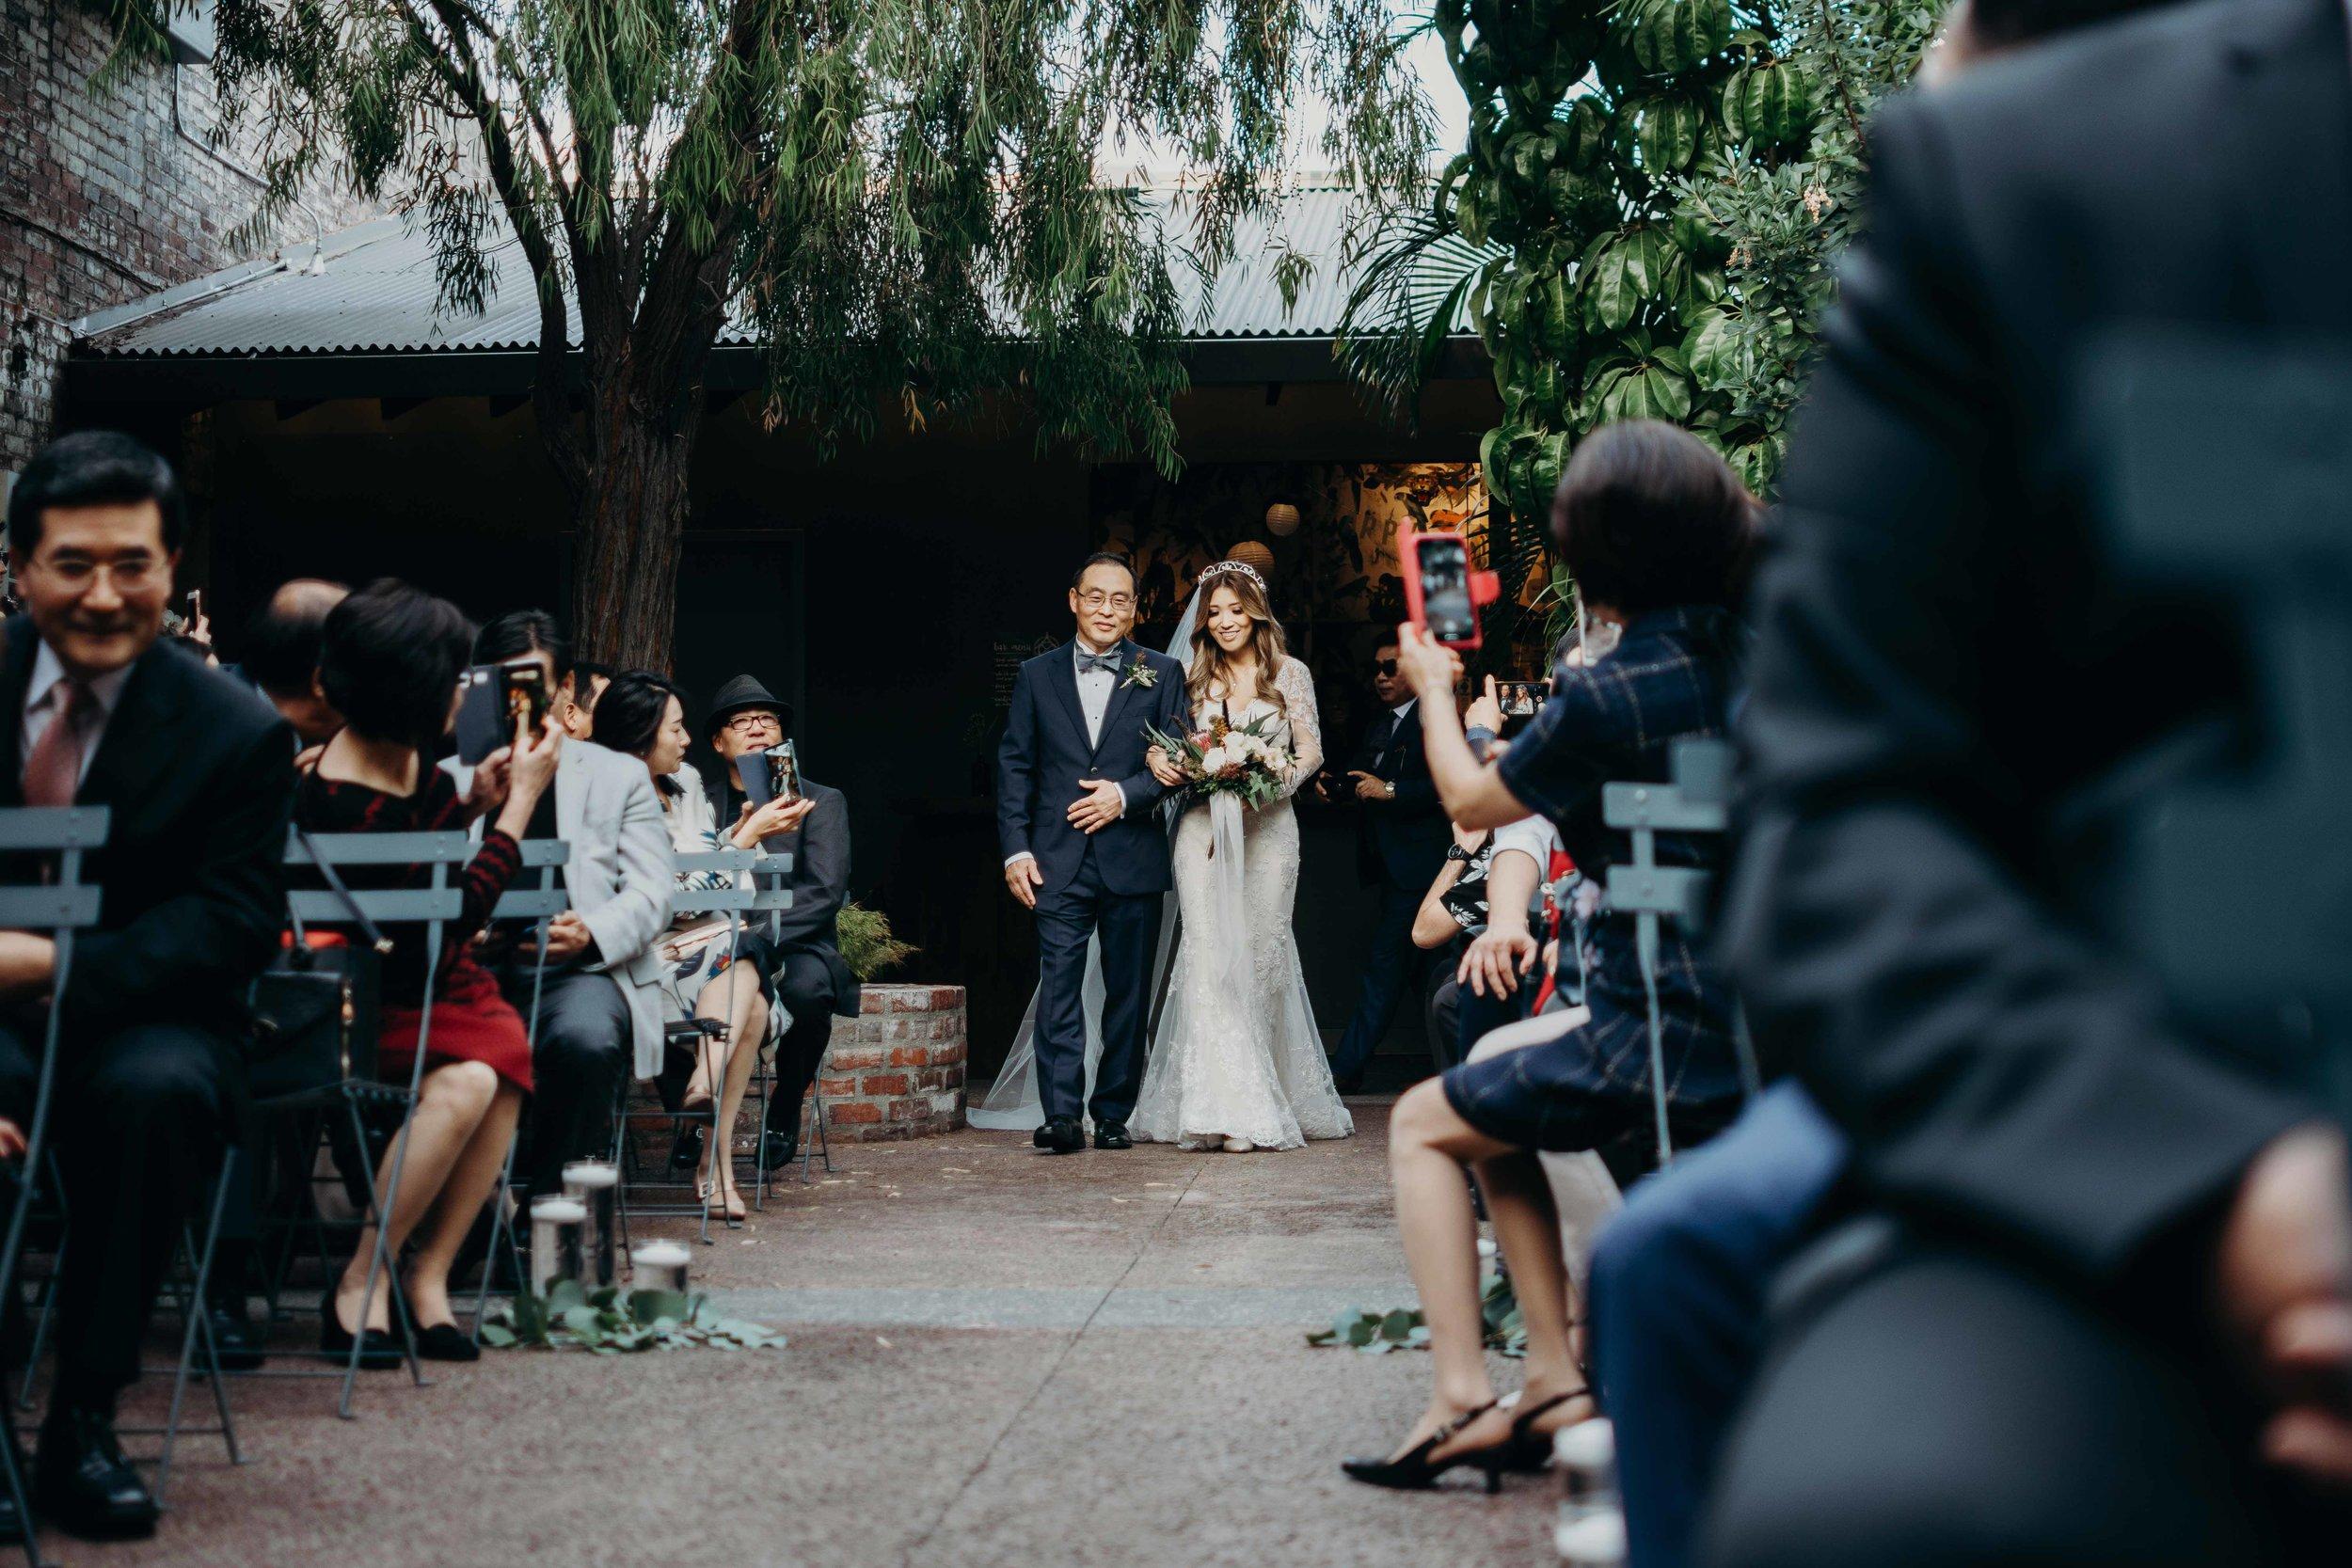 Cristina+Raymond Rd DTLA Millwick Wedding Post -_-85.jpg